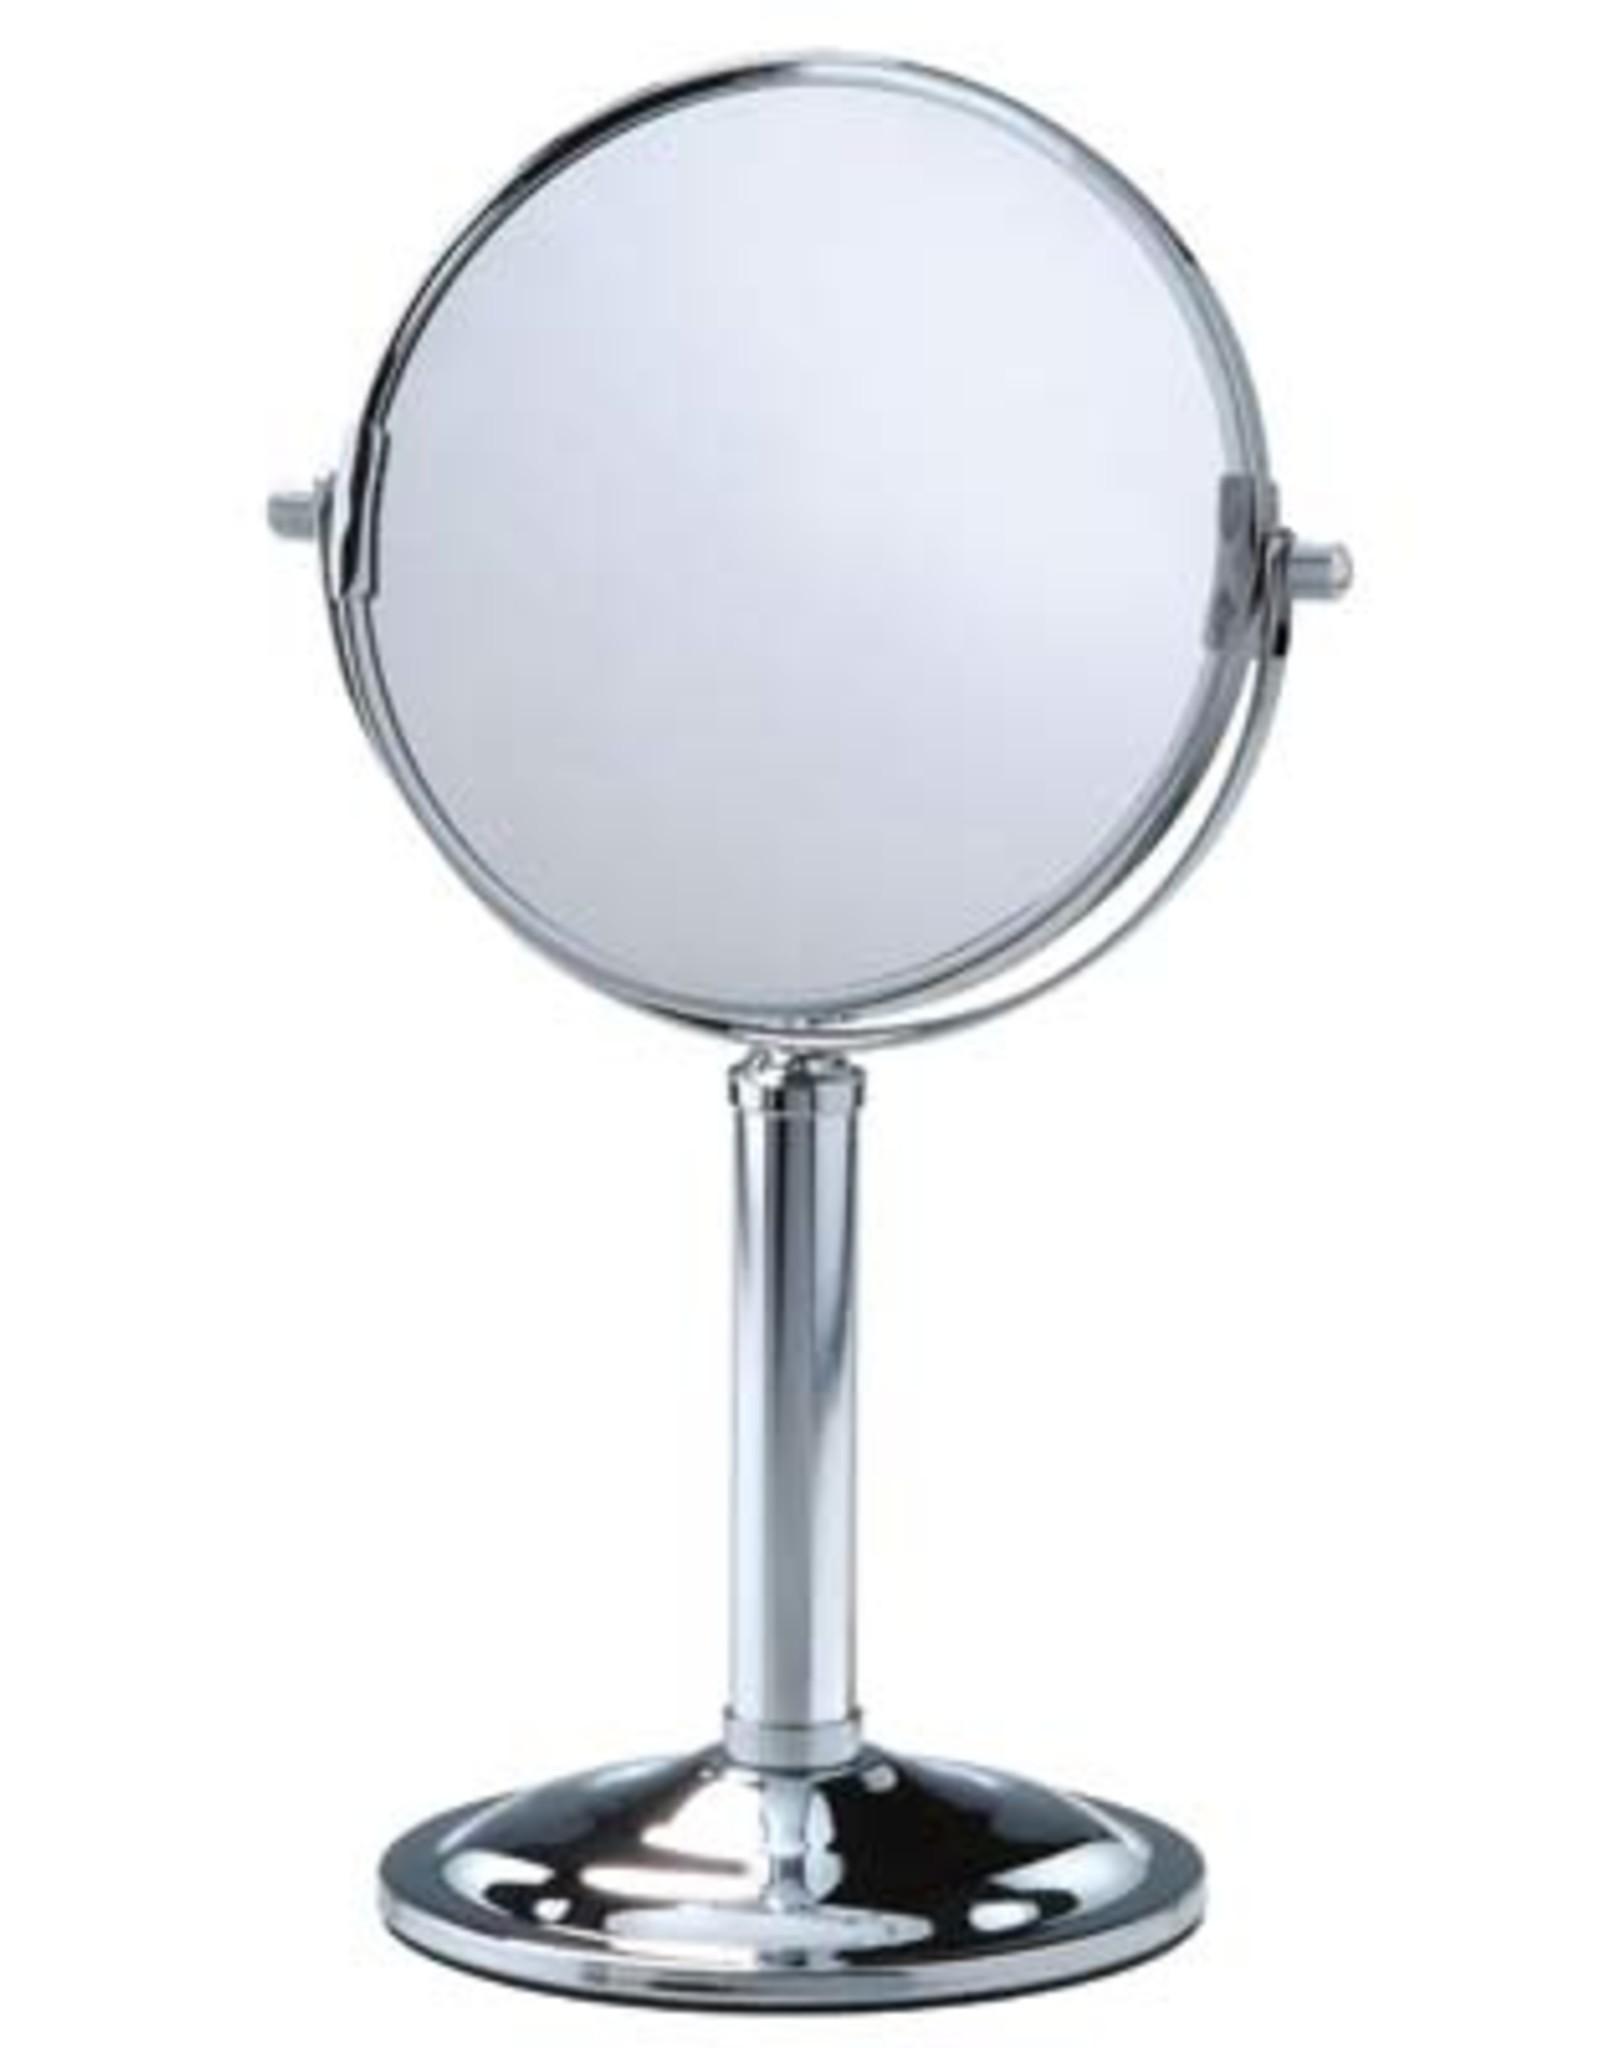 Taymor Taymor Countertop Vanity Mirror